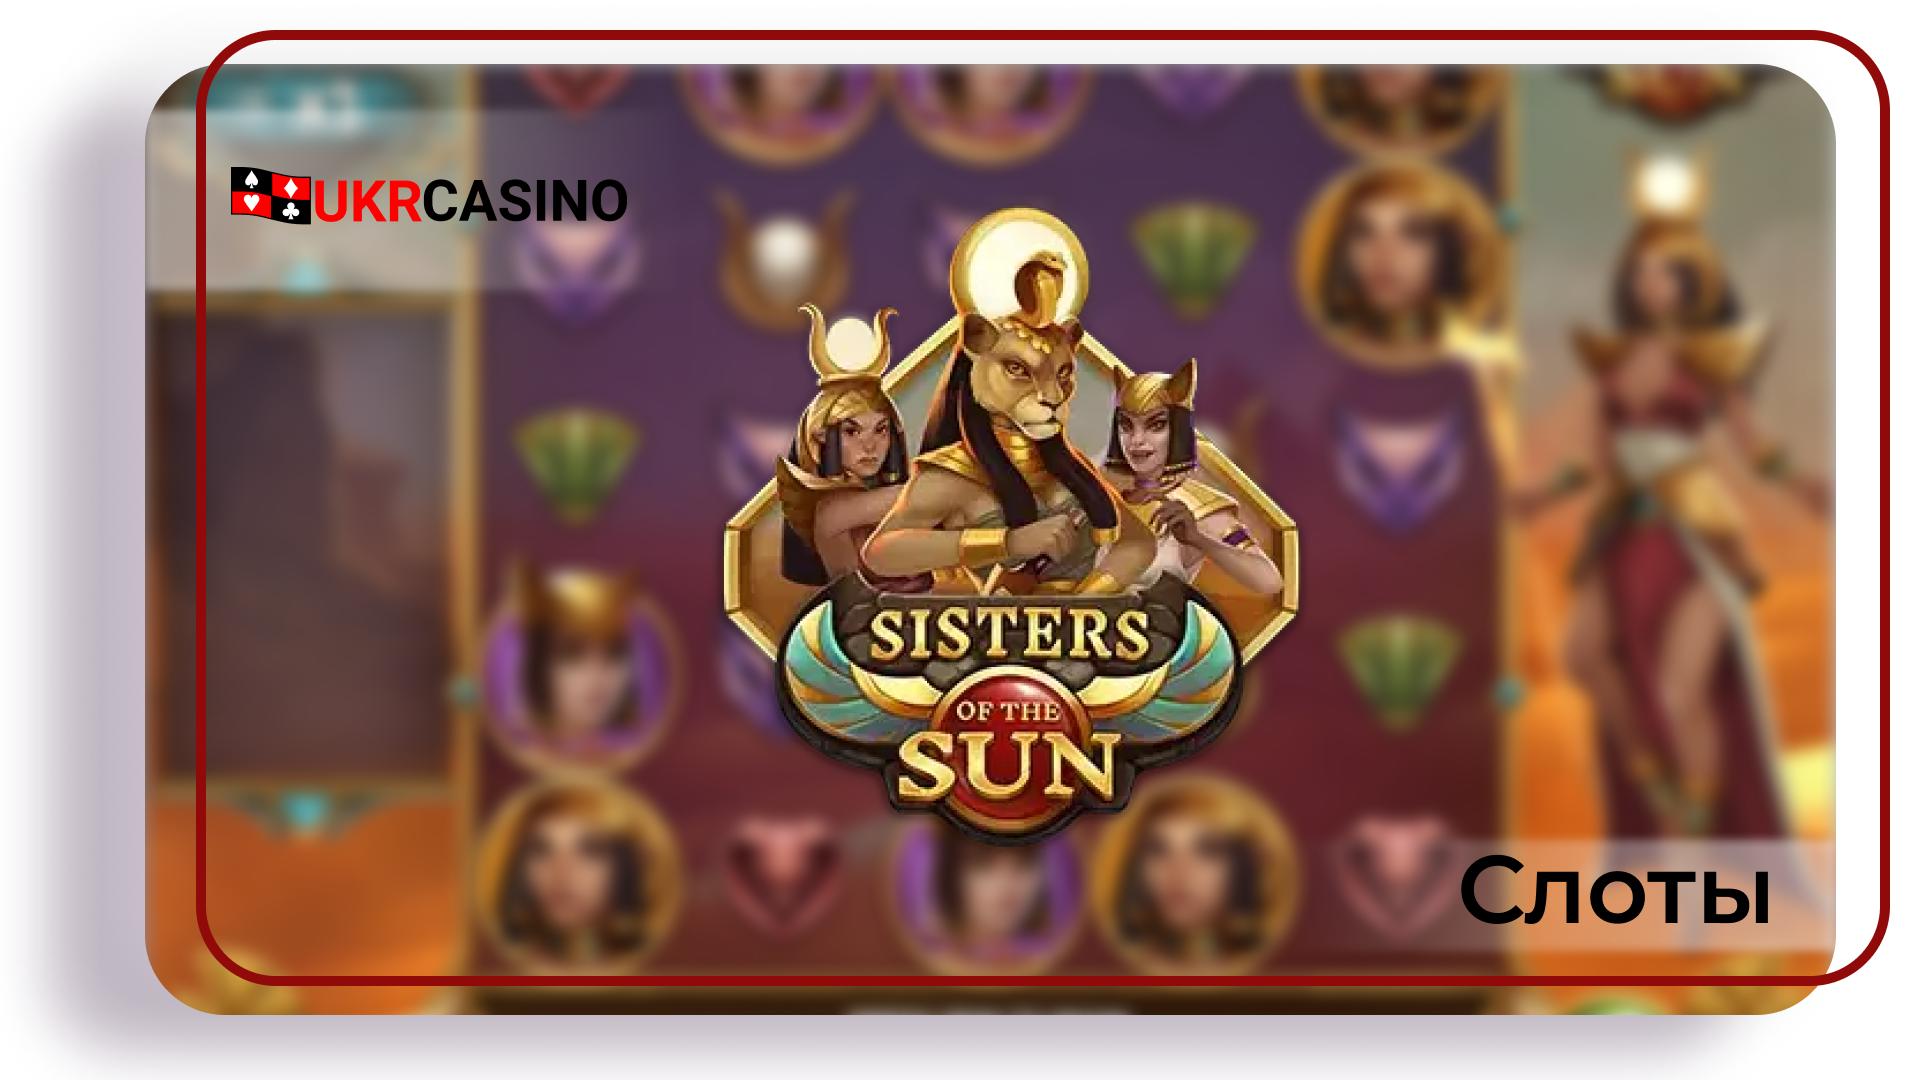 Sisters of the Sun - Play'n GO